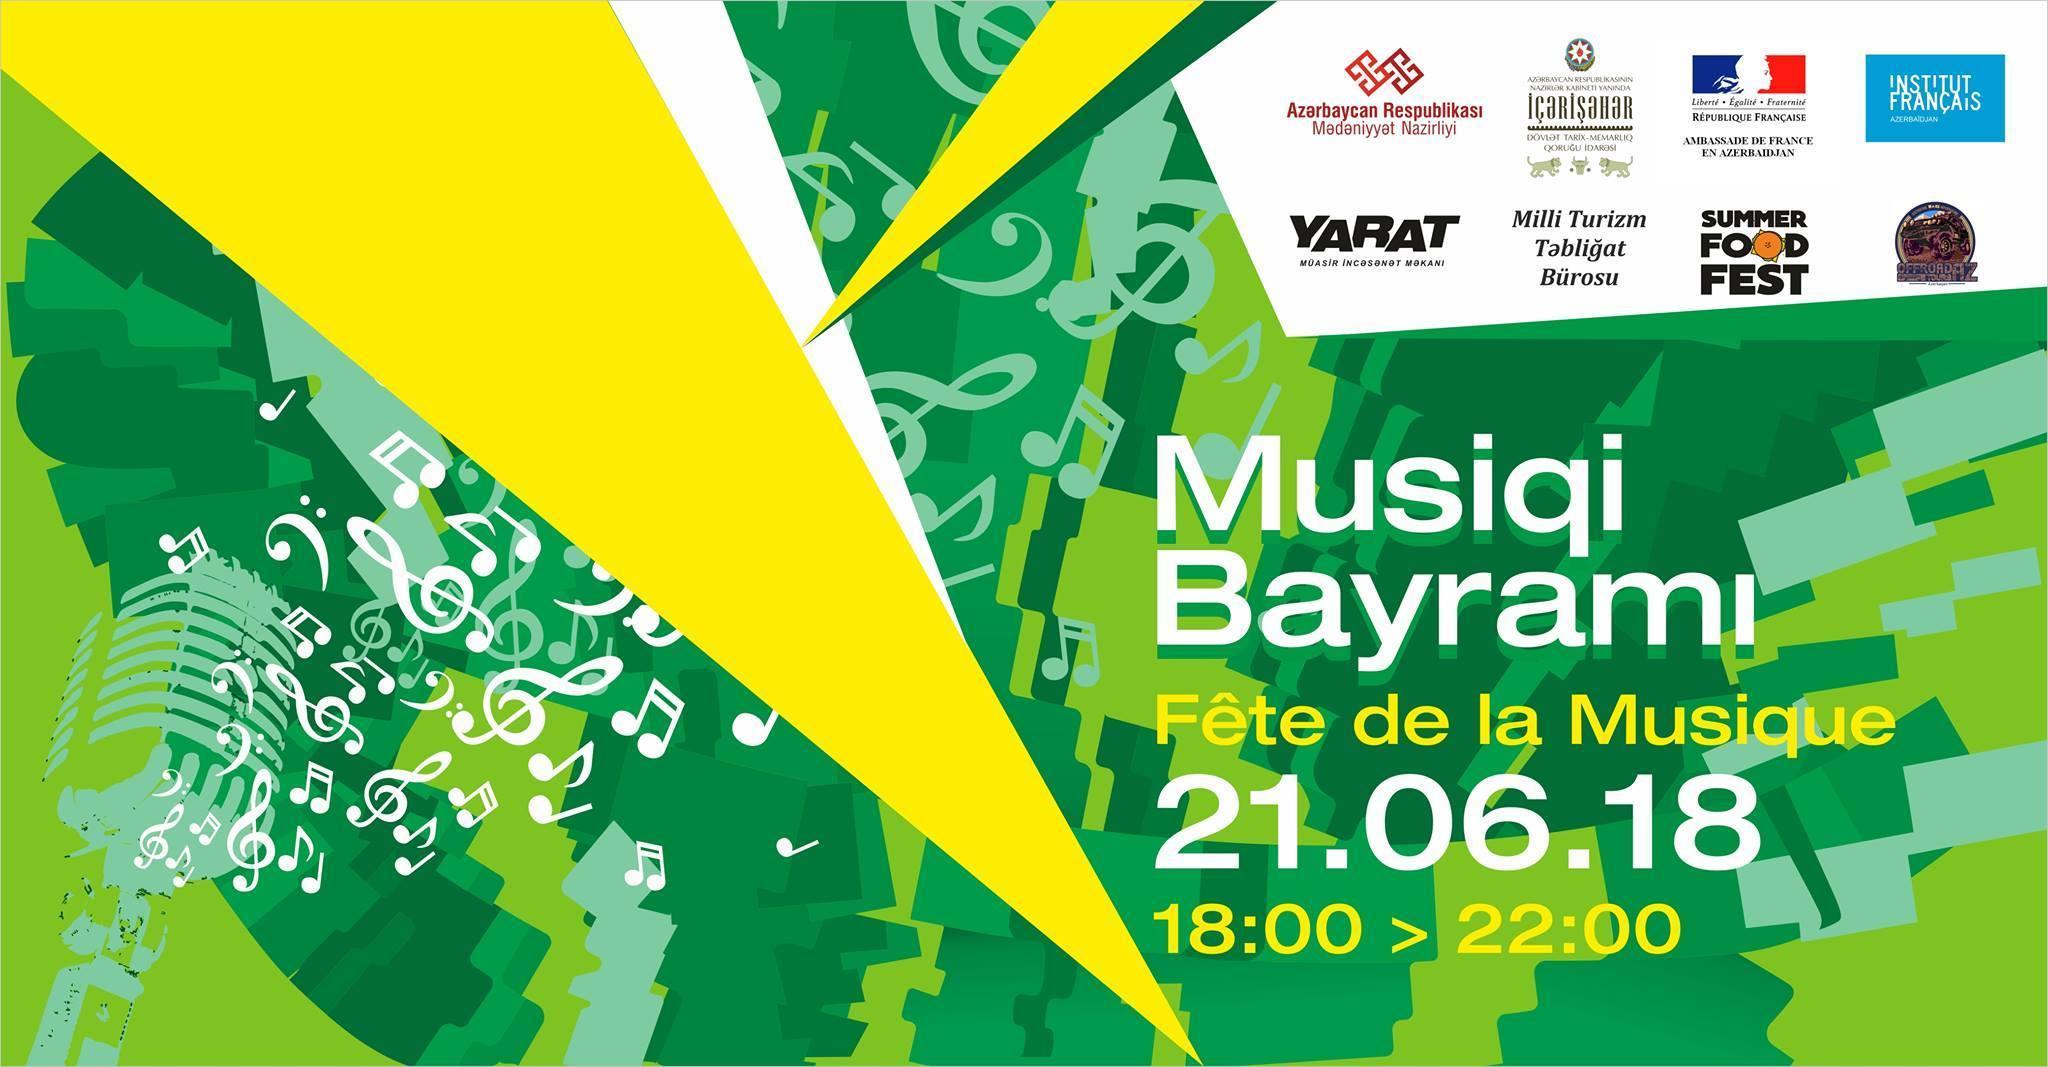 Baku to host Music Festival